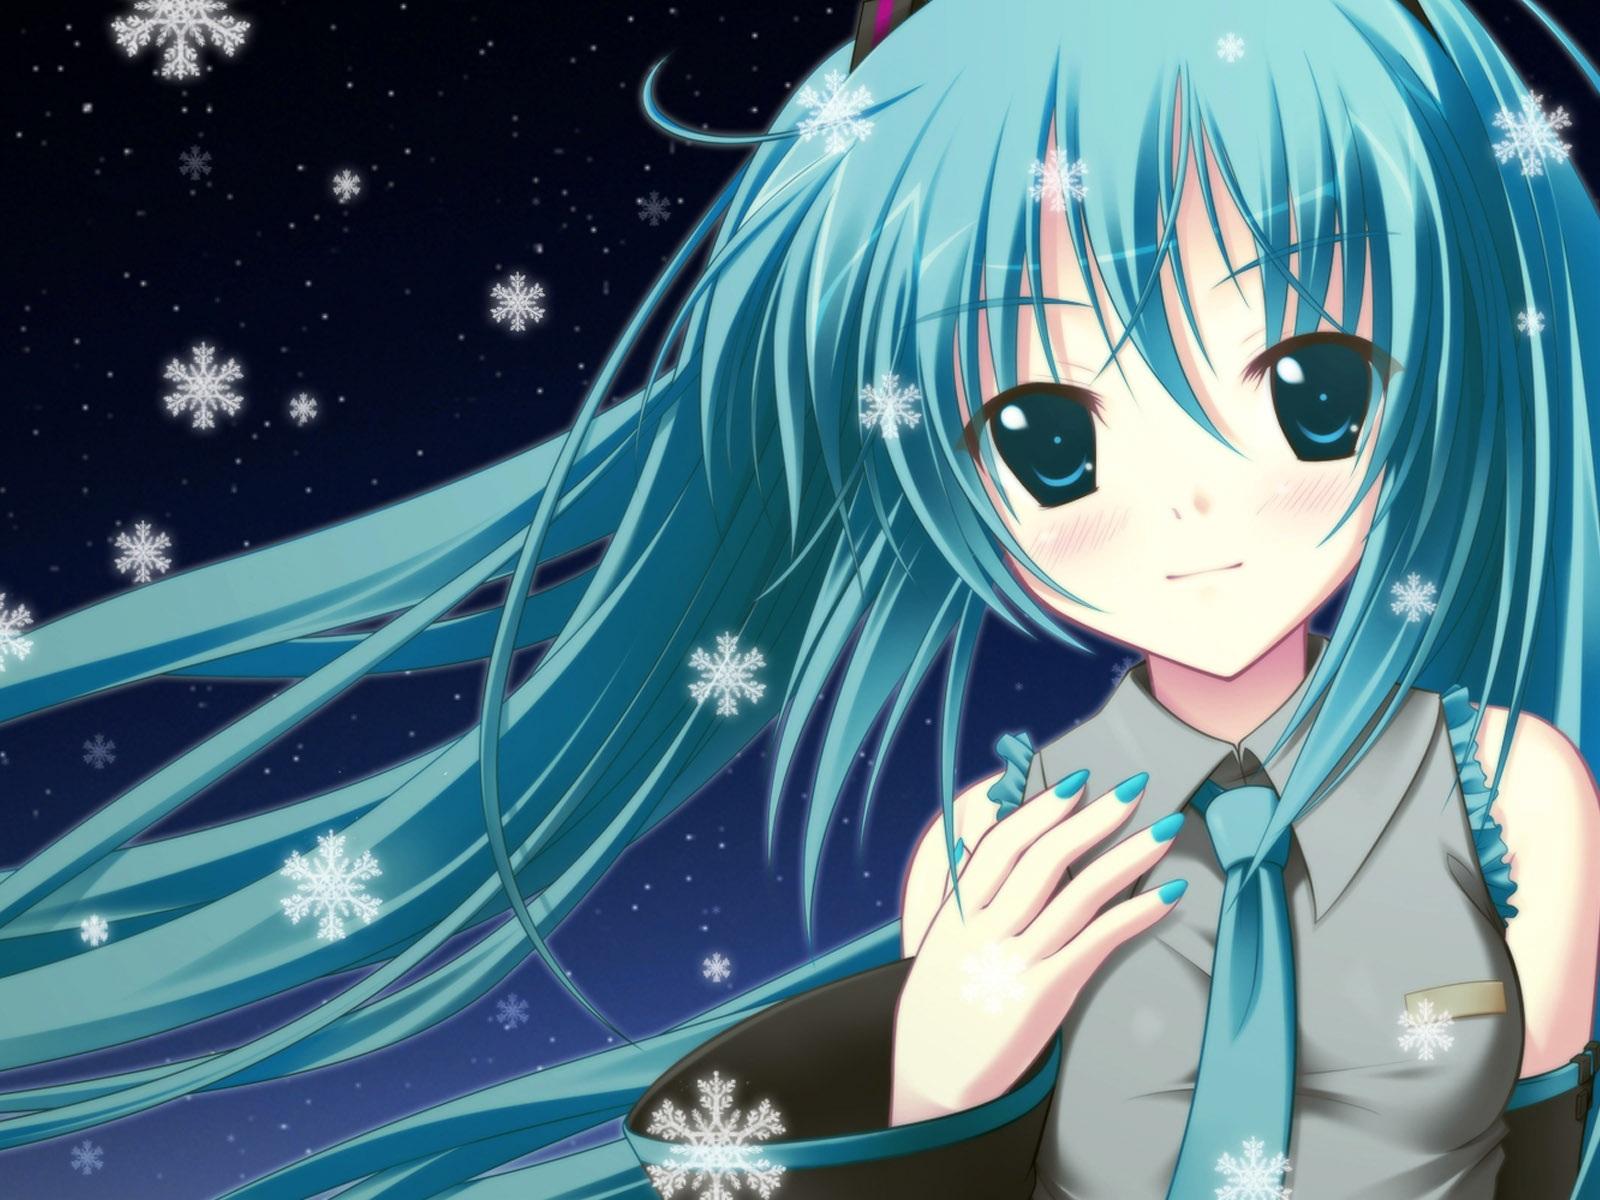 http://4.bp.blogspot.com/-9ouoGEGQWzA/Txo3NGi9MmI/AAAAAAAABlY/GdqzcWszZf0/s1600/Anime+Girl+Wallpaper+5.jpg